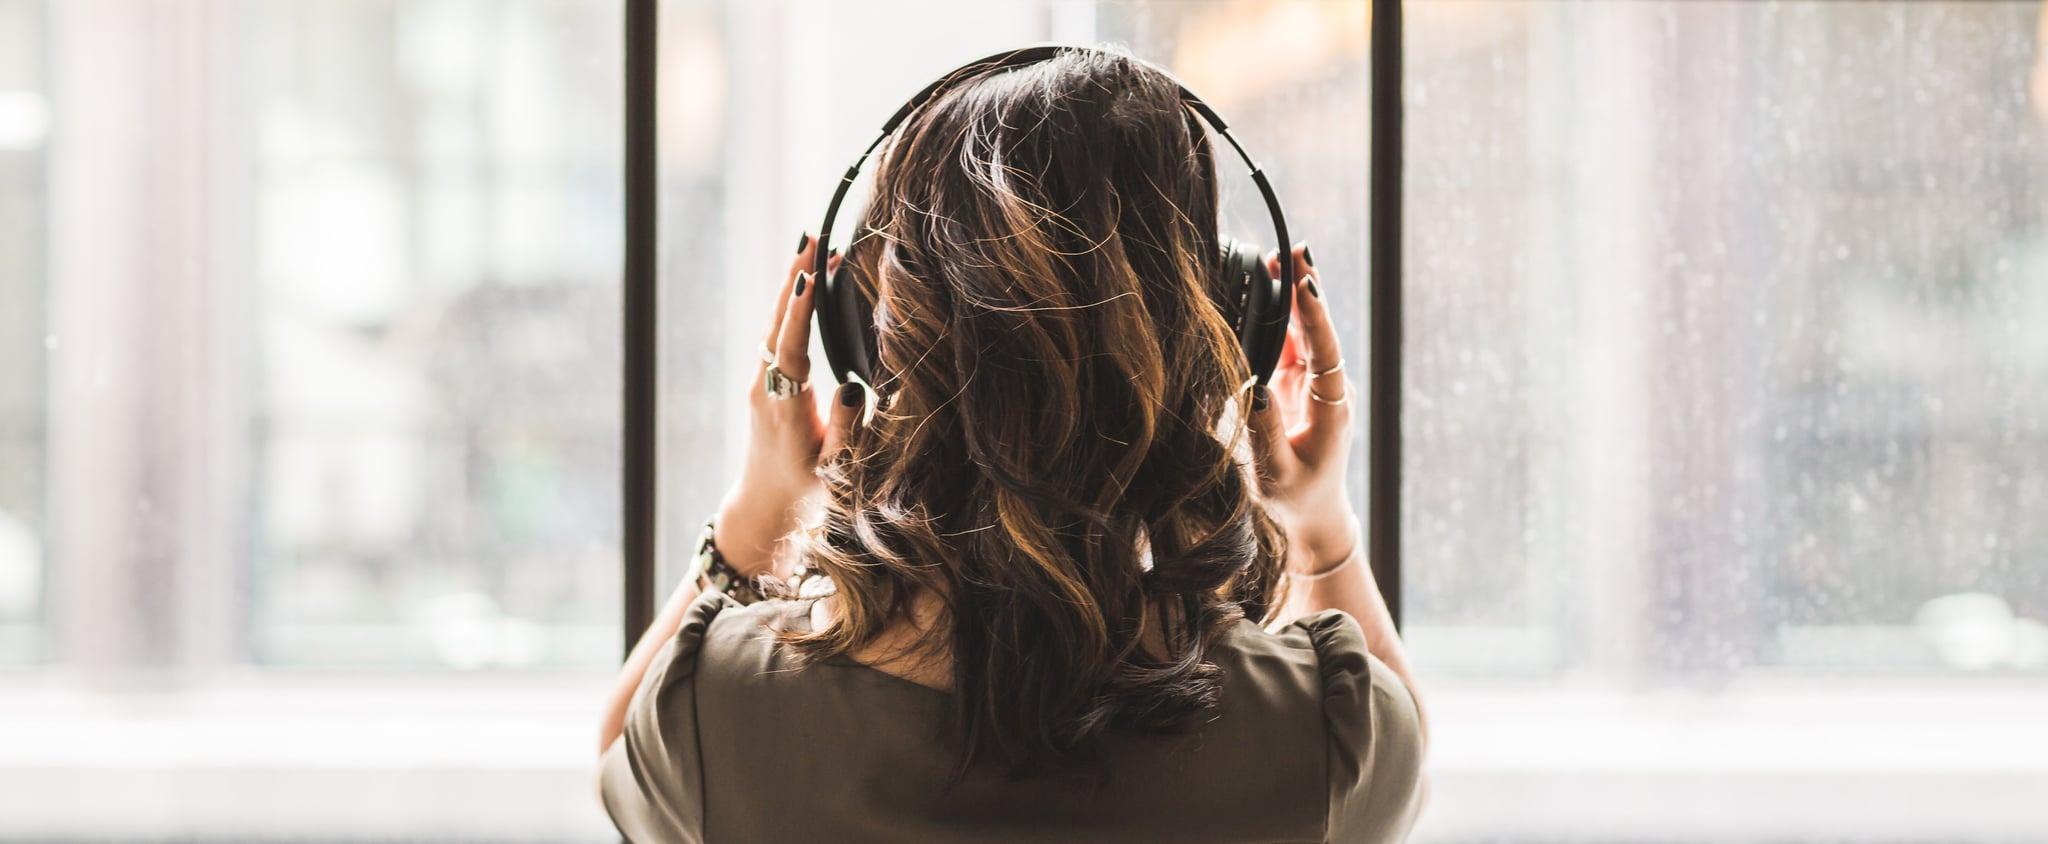 15 Latinx Alternative Artists to Keep on Your Radar